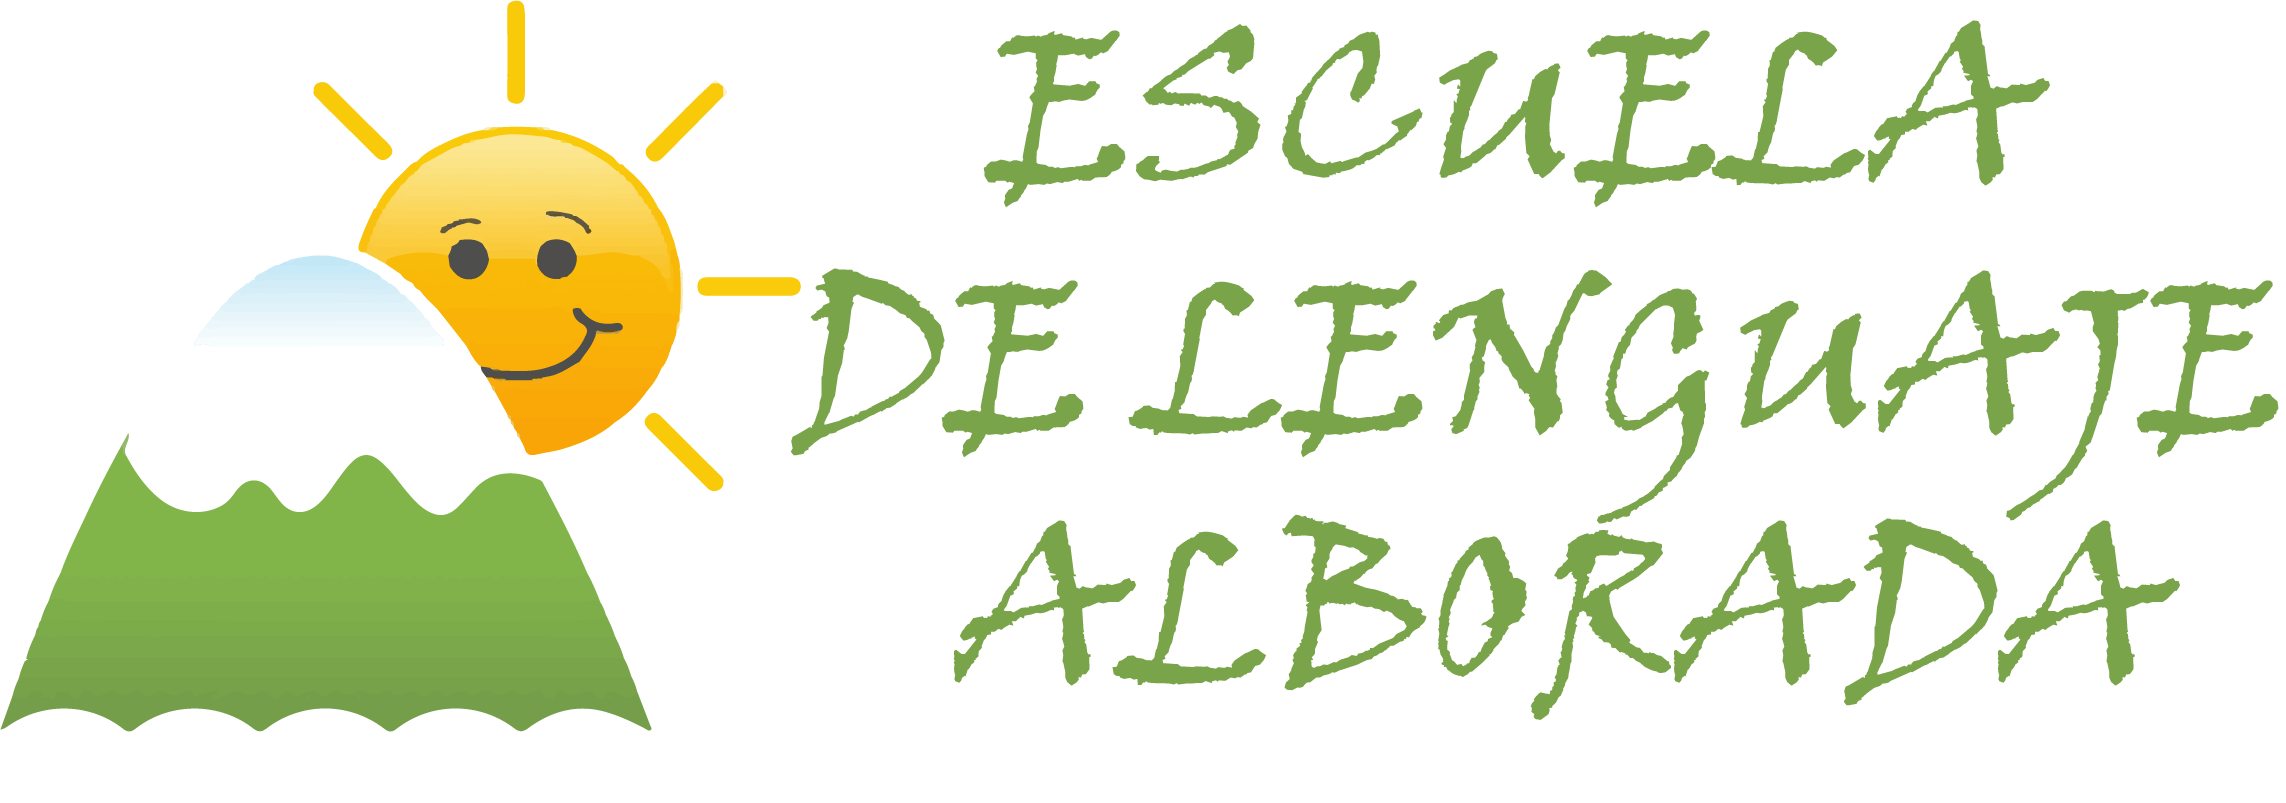 Escuela de Lenguaje Alborada